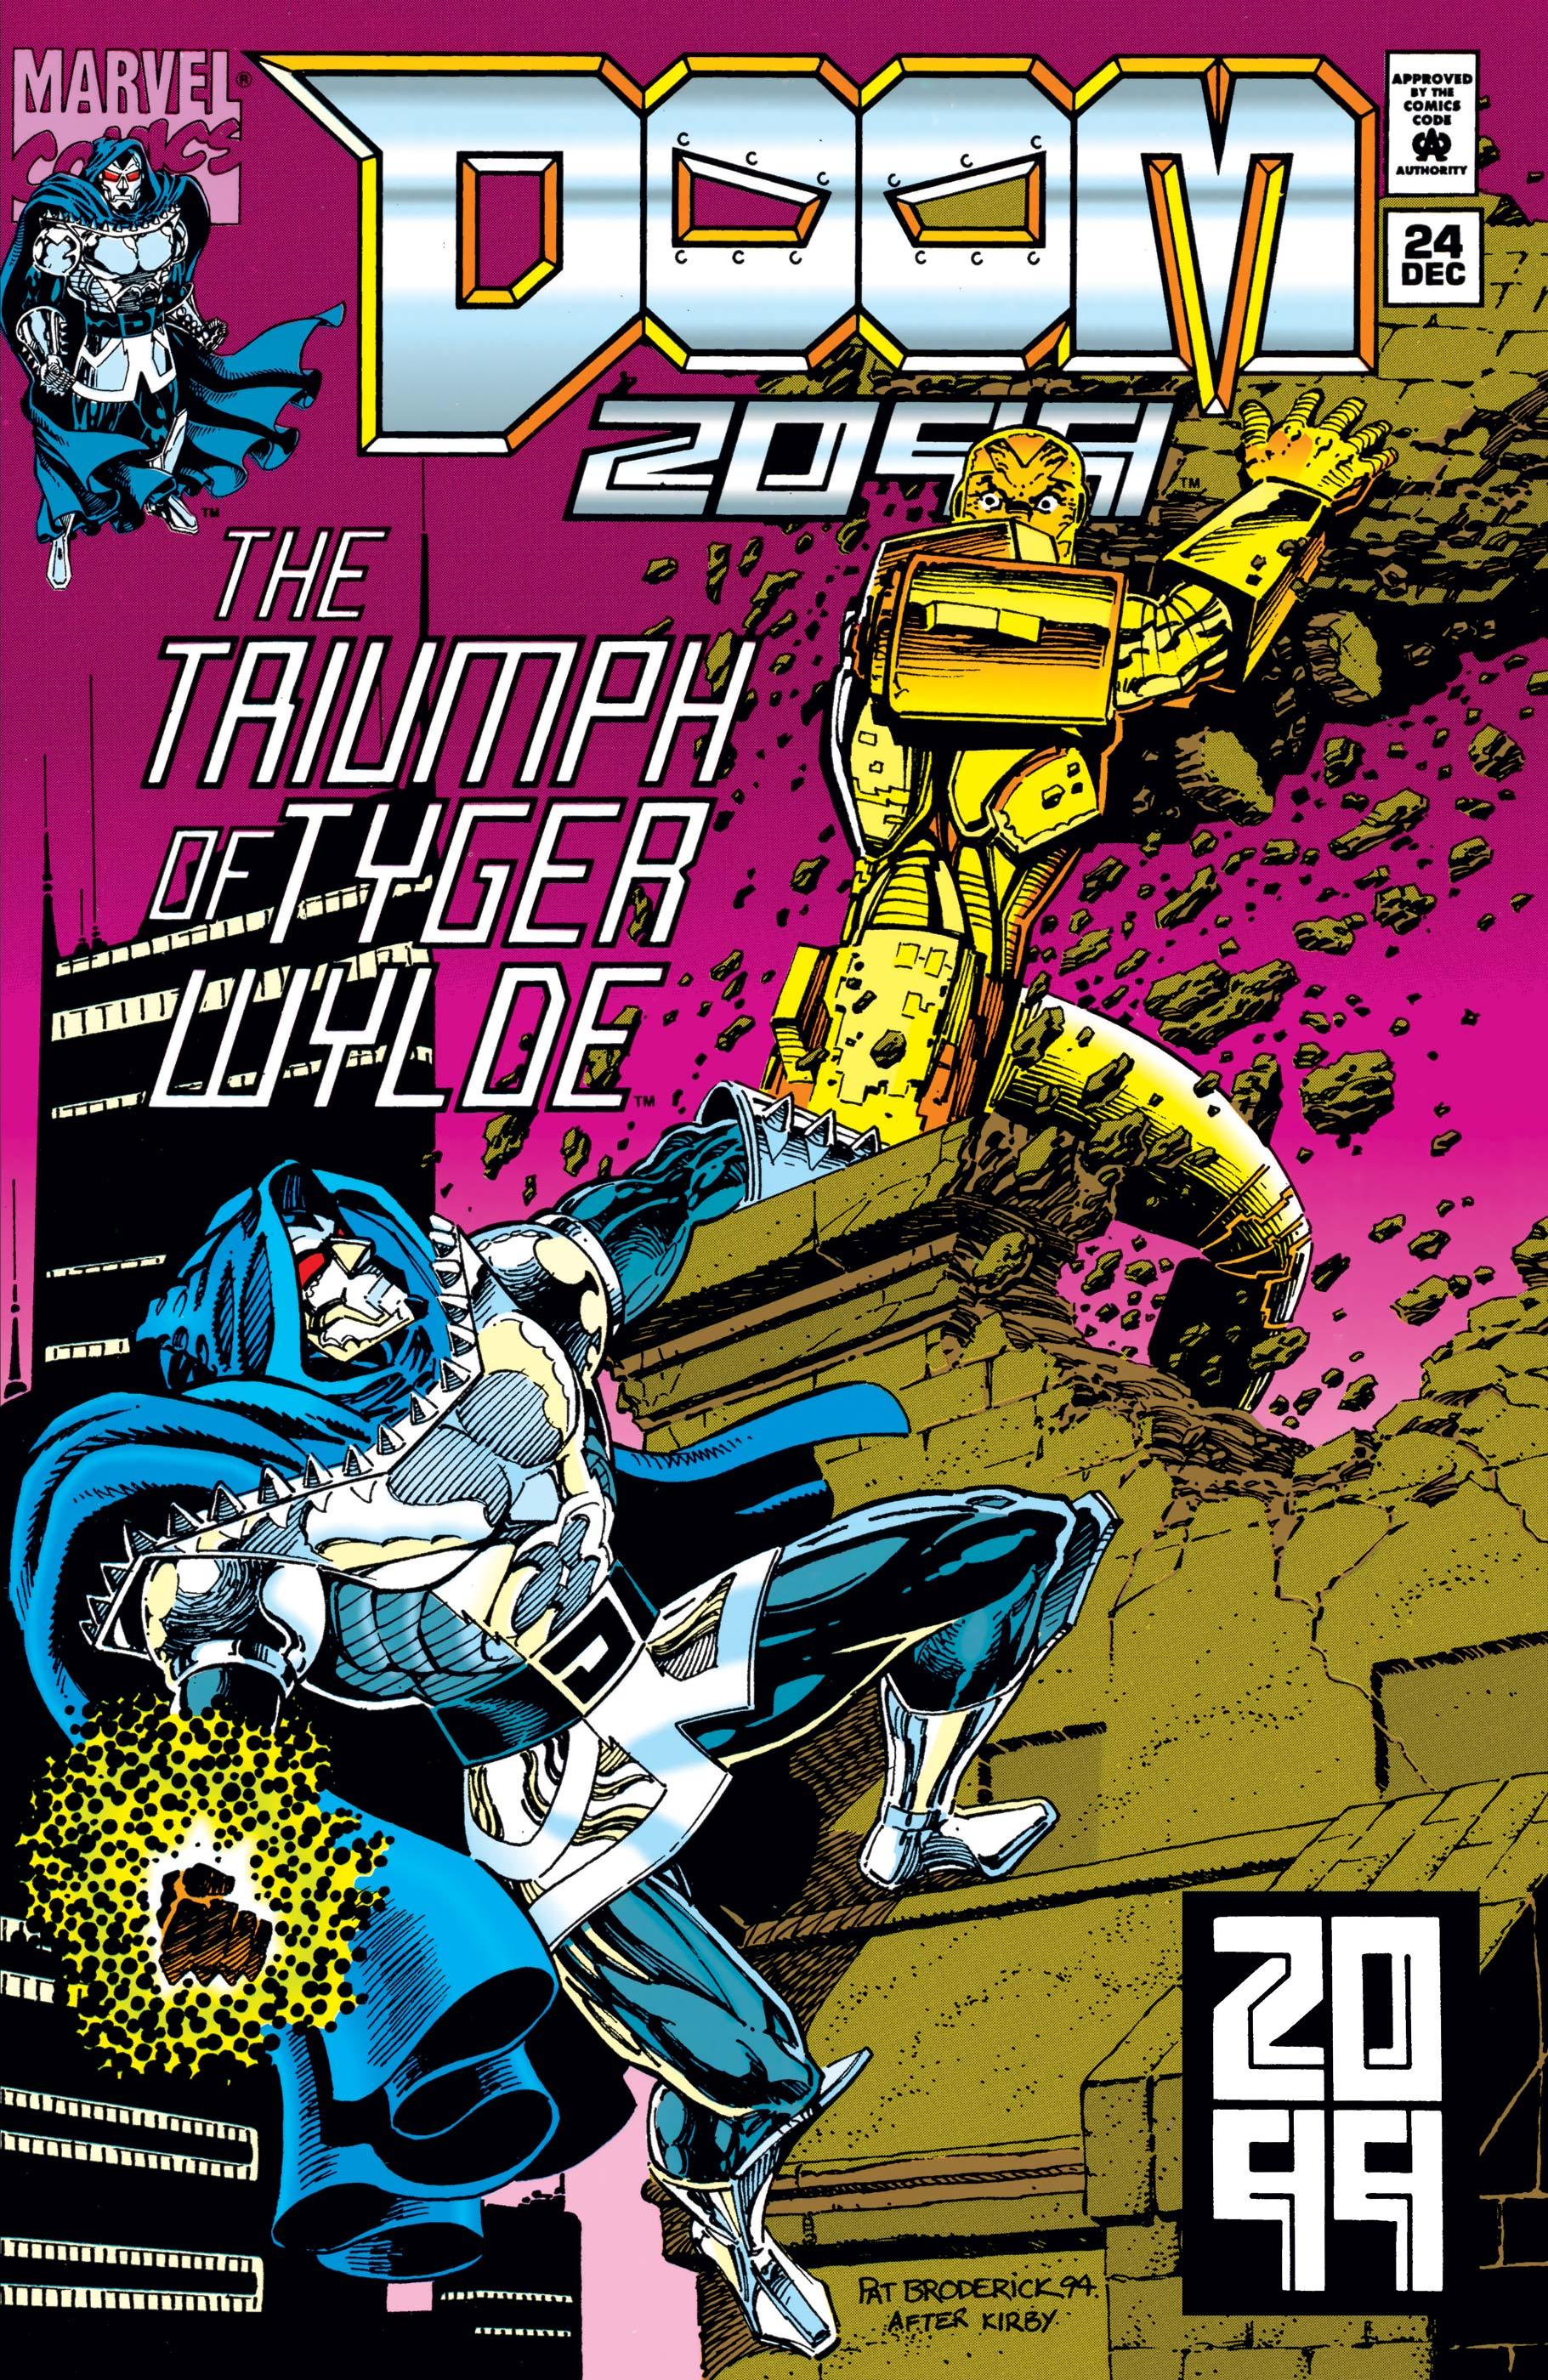 Doom 2099 (1993) #24